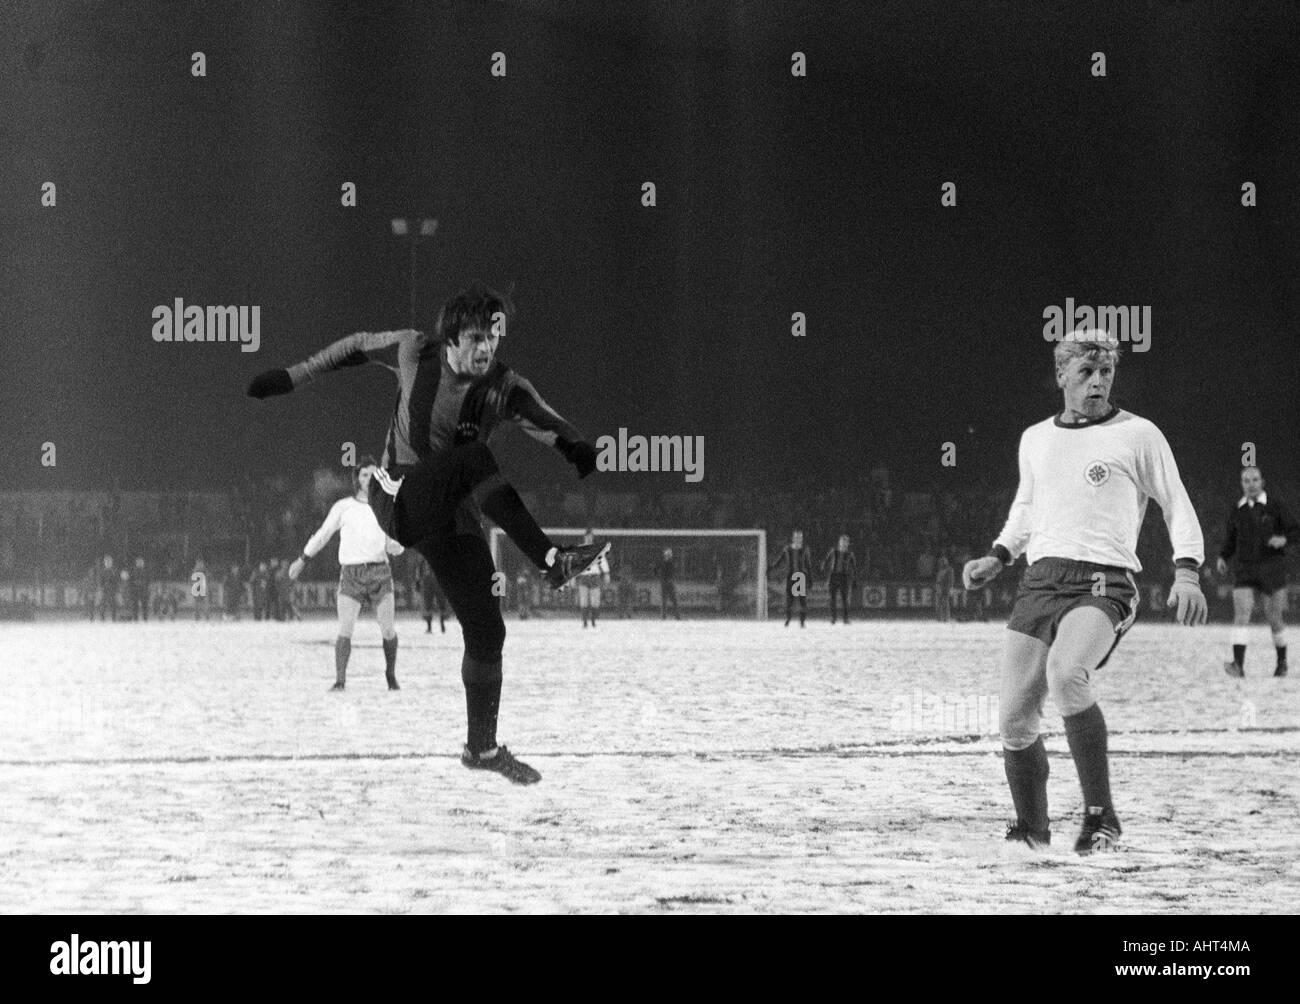 football, Bundesliga, 1970/1971, Rot-Weiss Oberhausen versus Hertha BSC Berlin 1:1, Niederrhein Stadium, game on snow ground, scene of the match, Lorenz Horr (Hertha) left shots on goal, right Gert Froehlich (RWO) - Stock Image